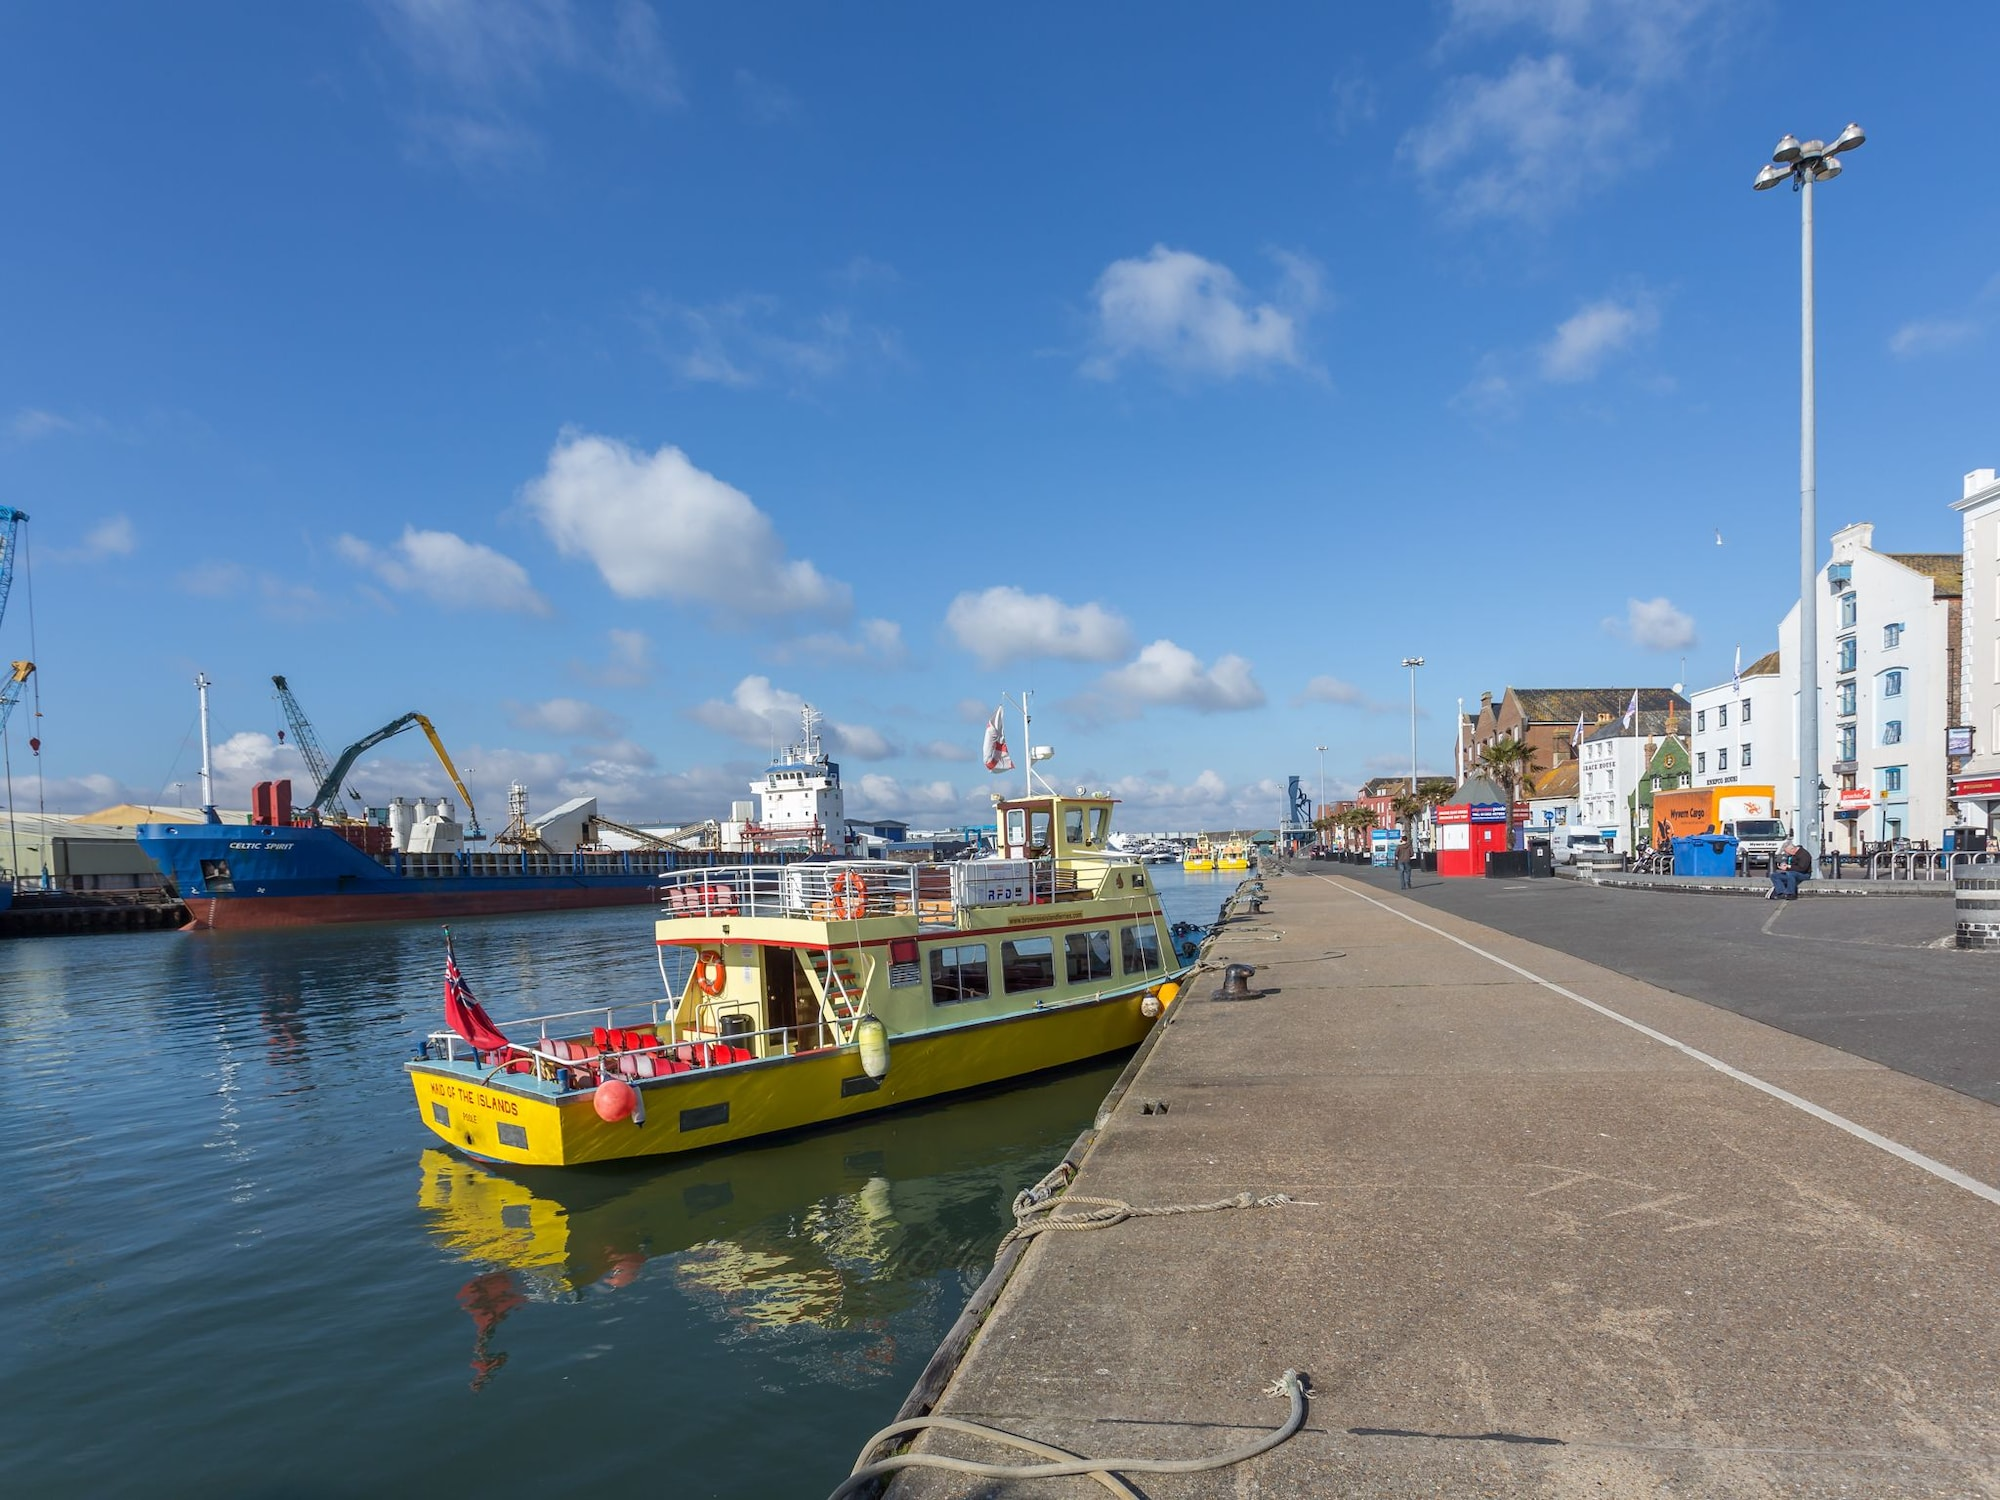 Galician Shore, Poole